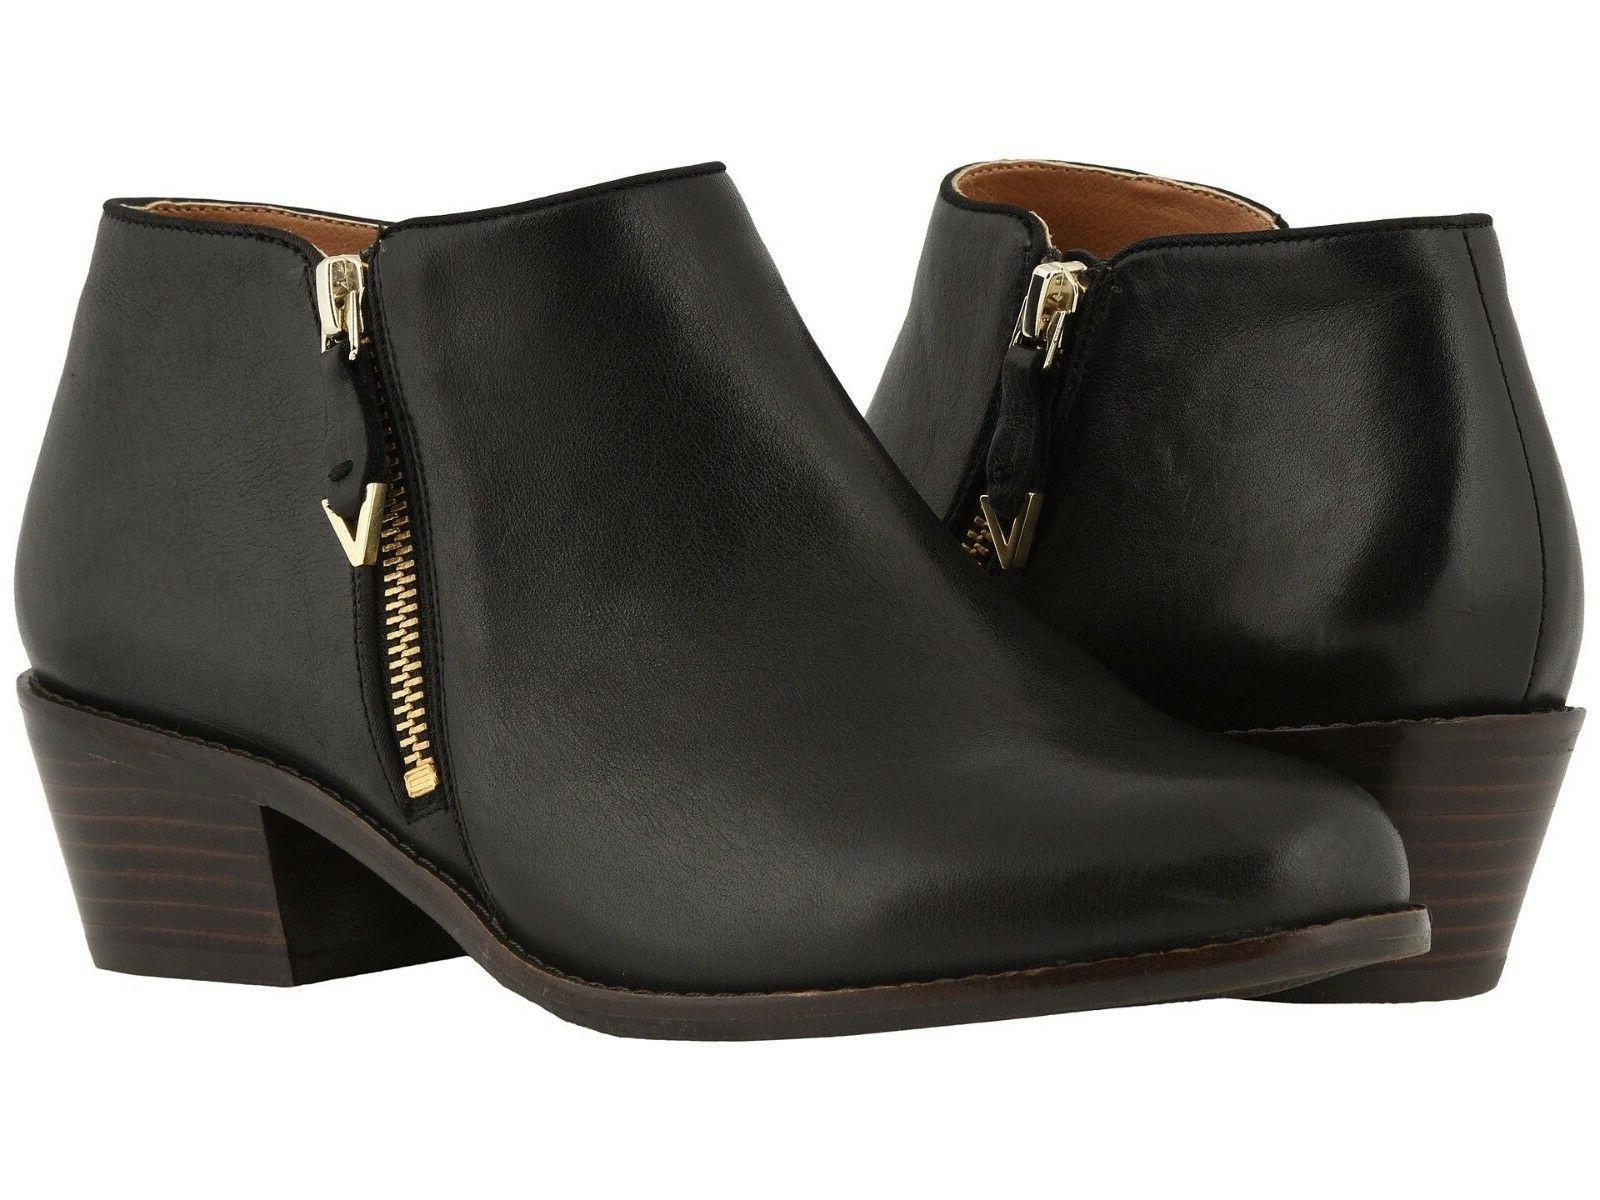 Women's Vionic Jolene Leather Ankle Booties Black US Sizes